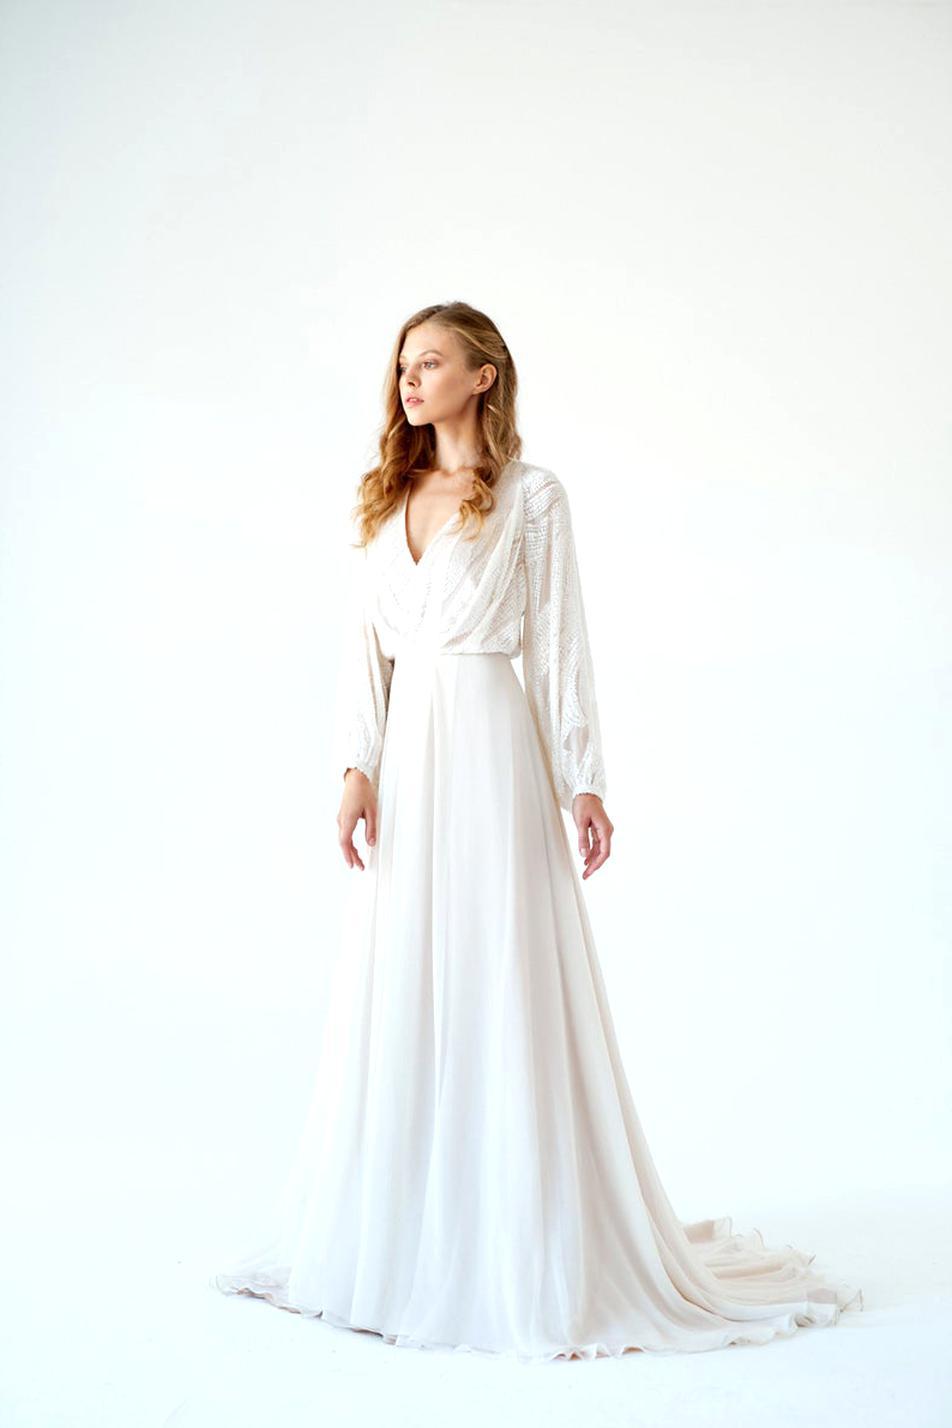 Boho Wedding Dress For Sale Only 3 Left At 65